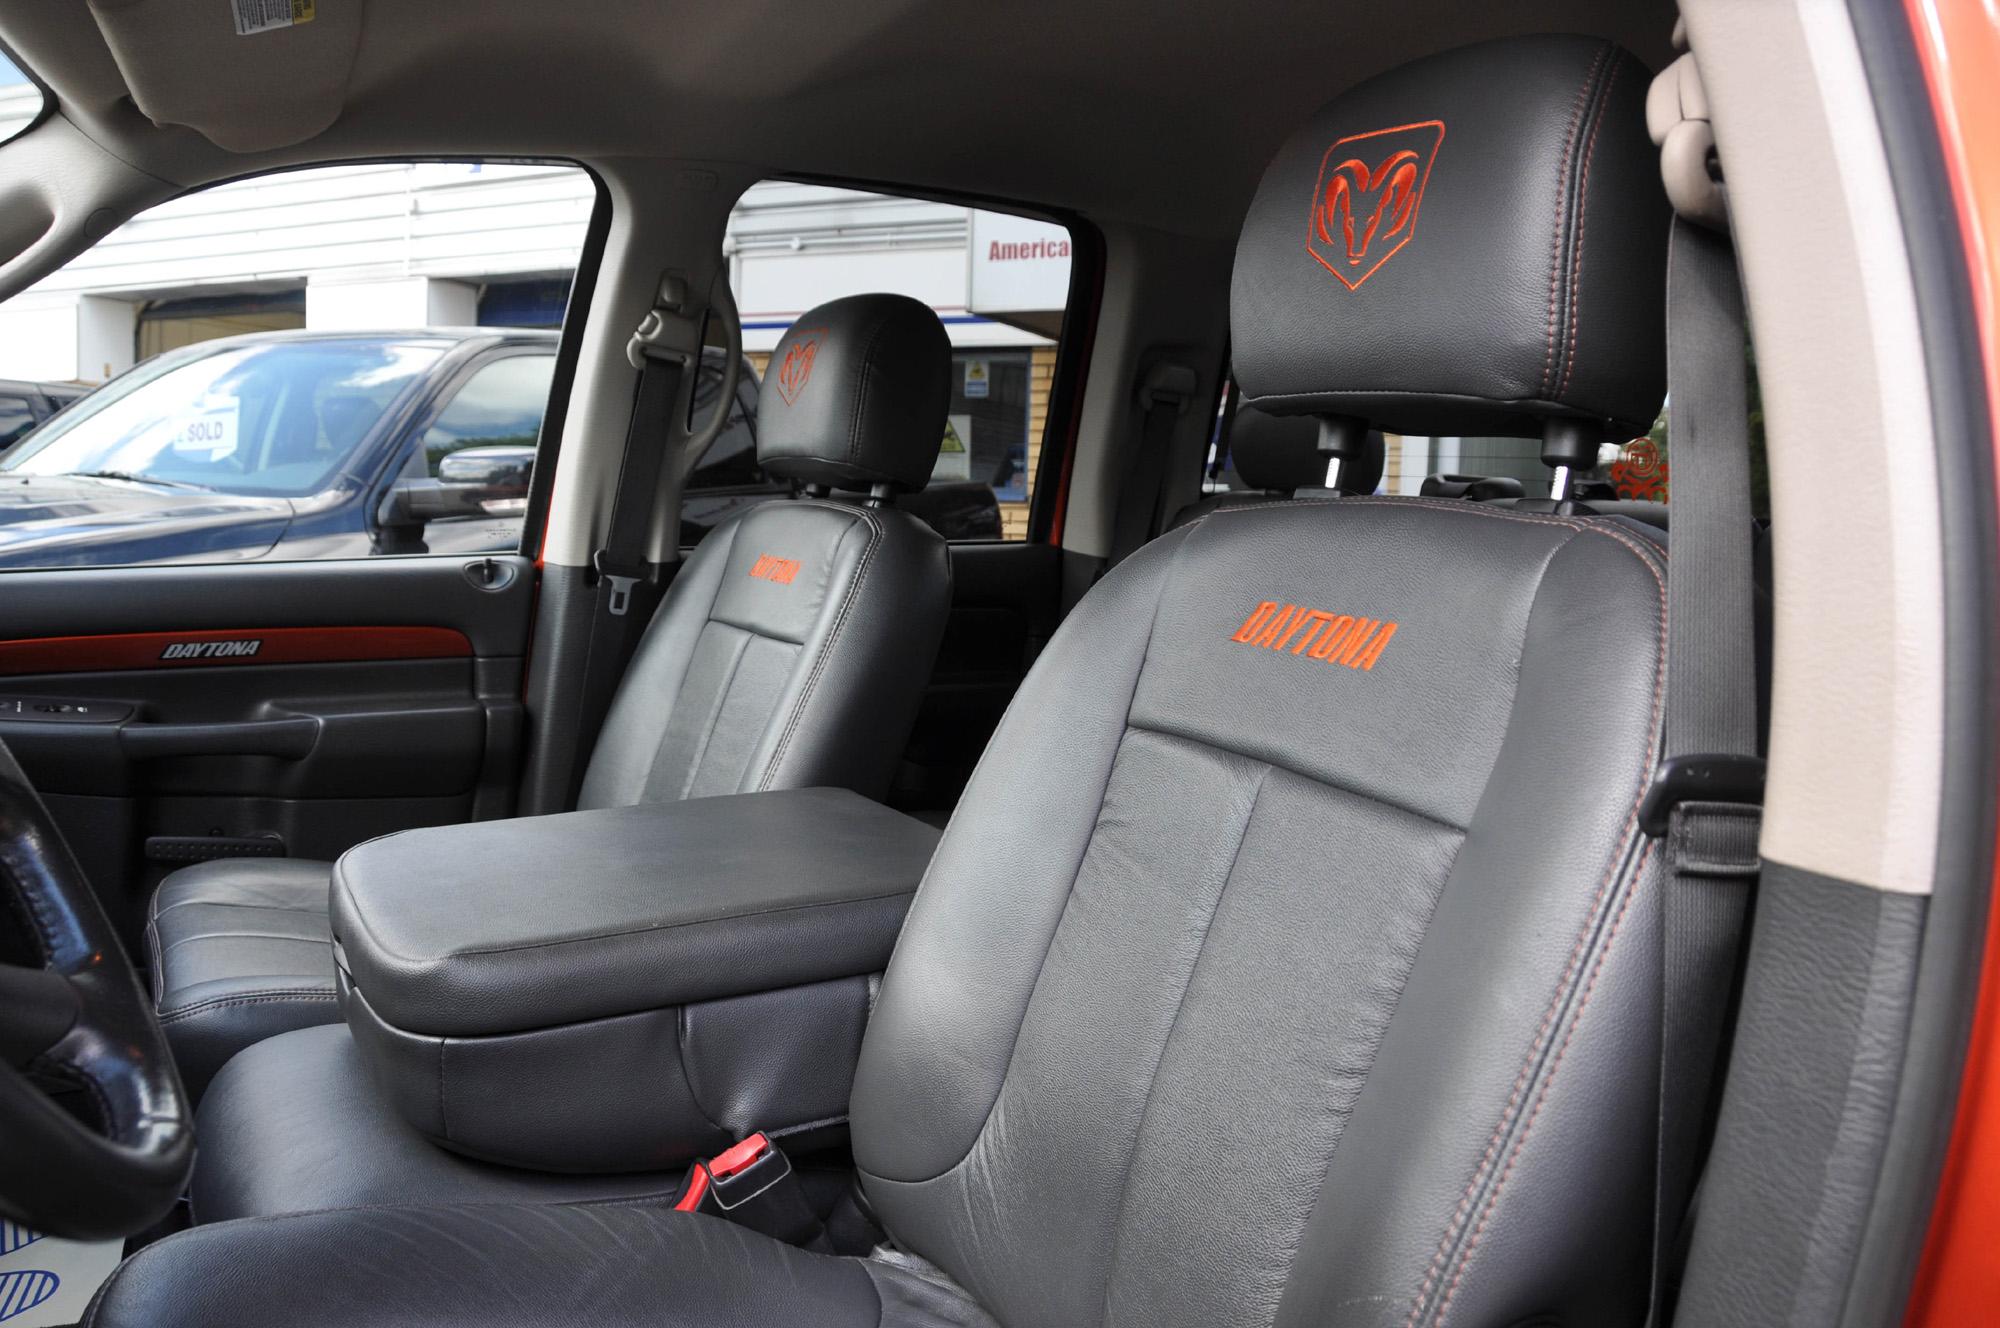 2005 55 Dodge Ram 1500 Daytona Quad Cab All Wheel Drive